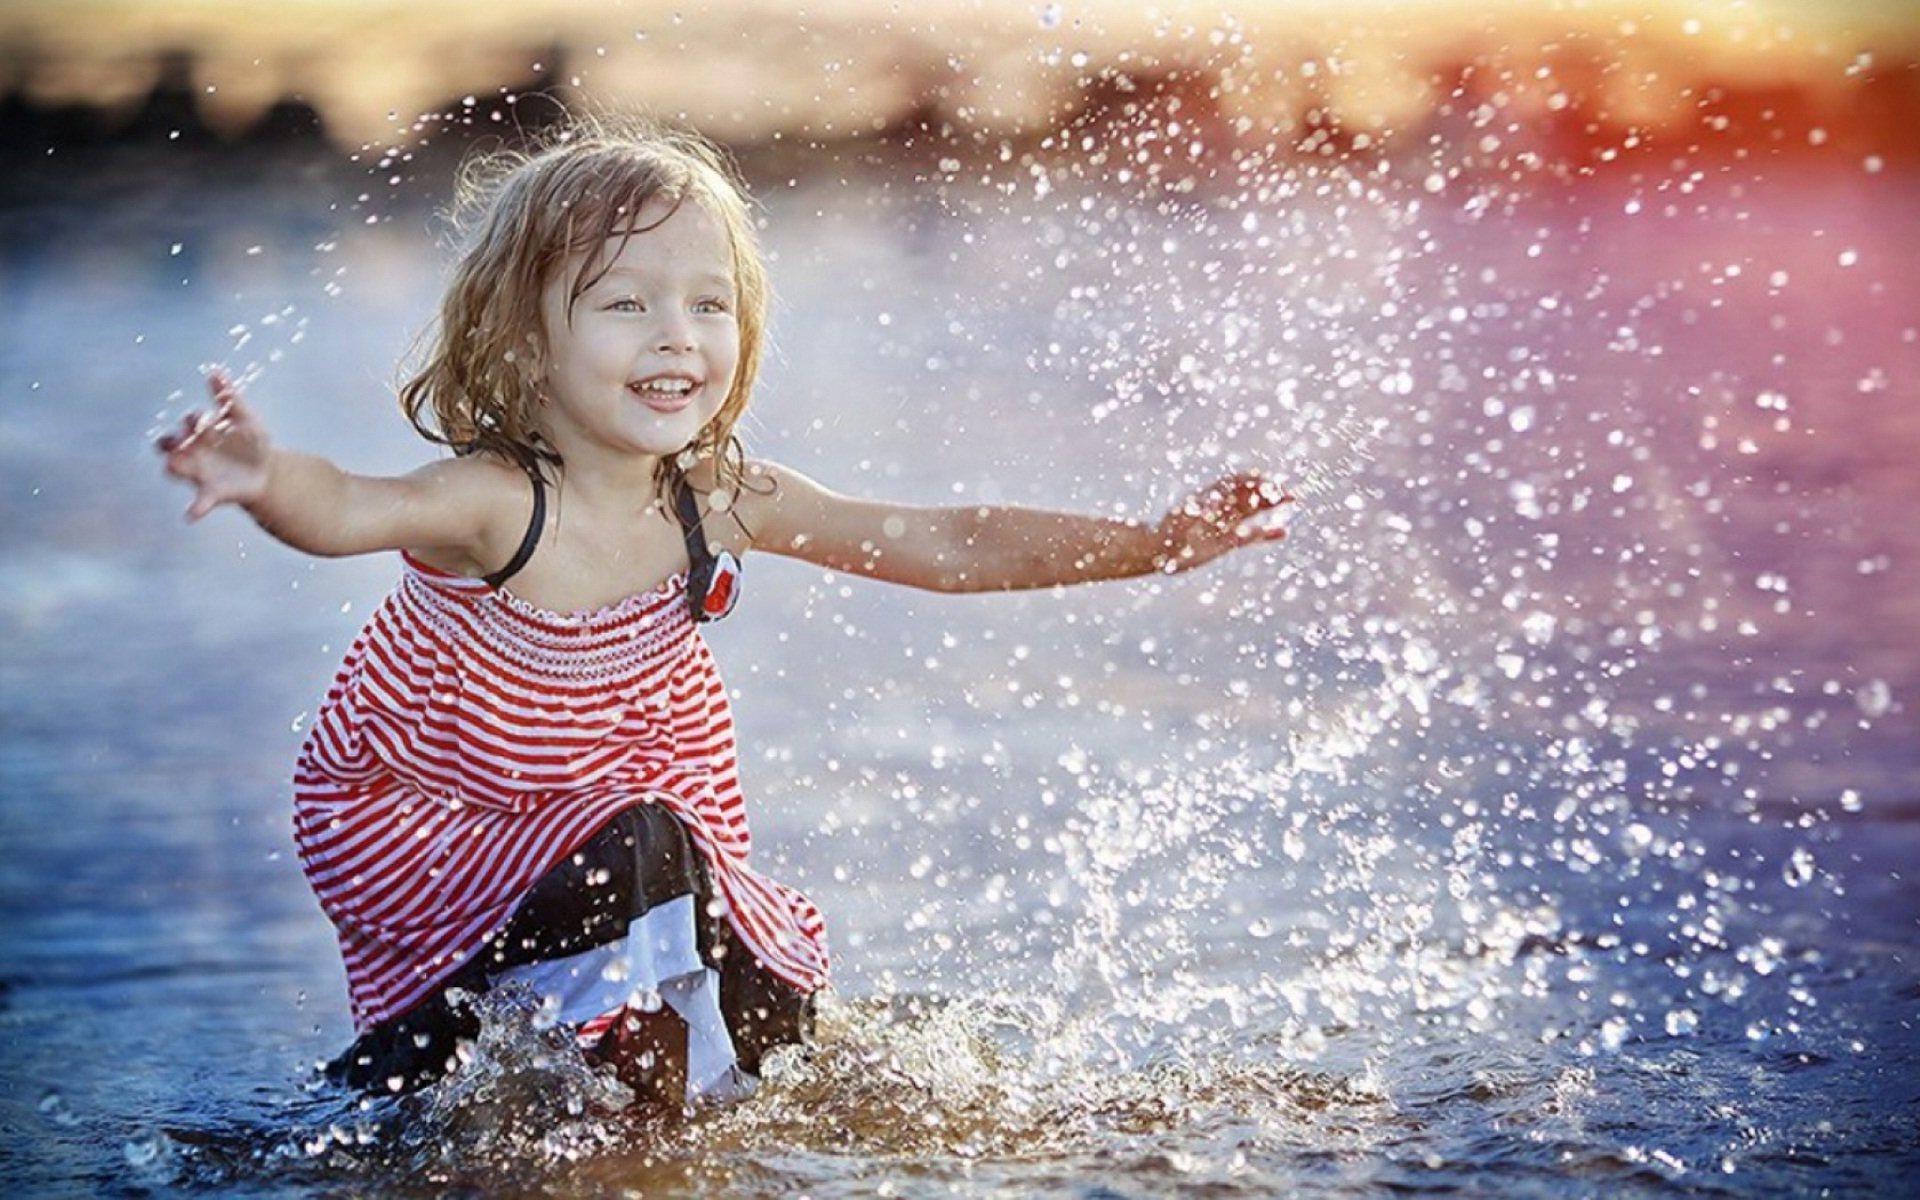 Cute Baby Girl Wallpaper HD Download For Desktop Mobile ×